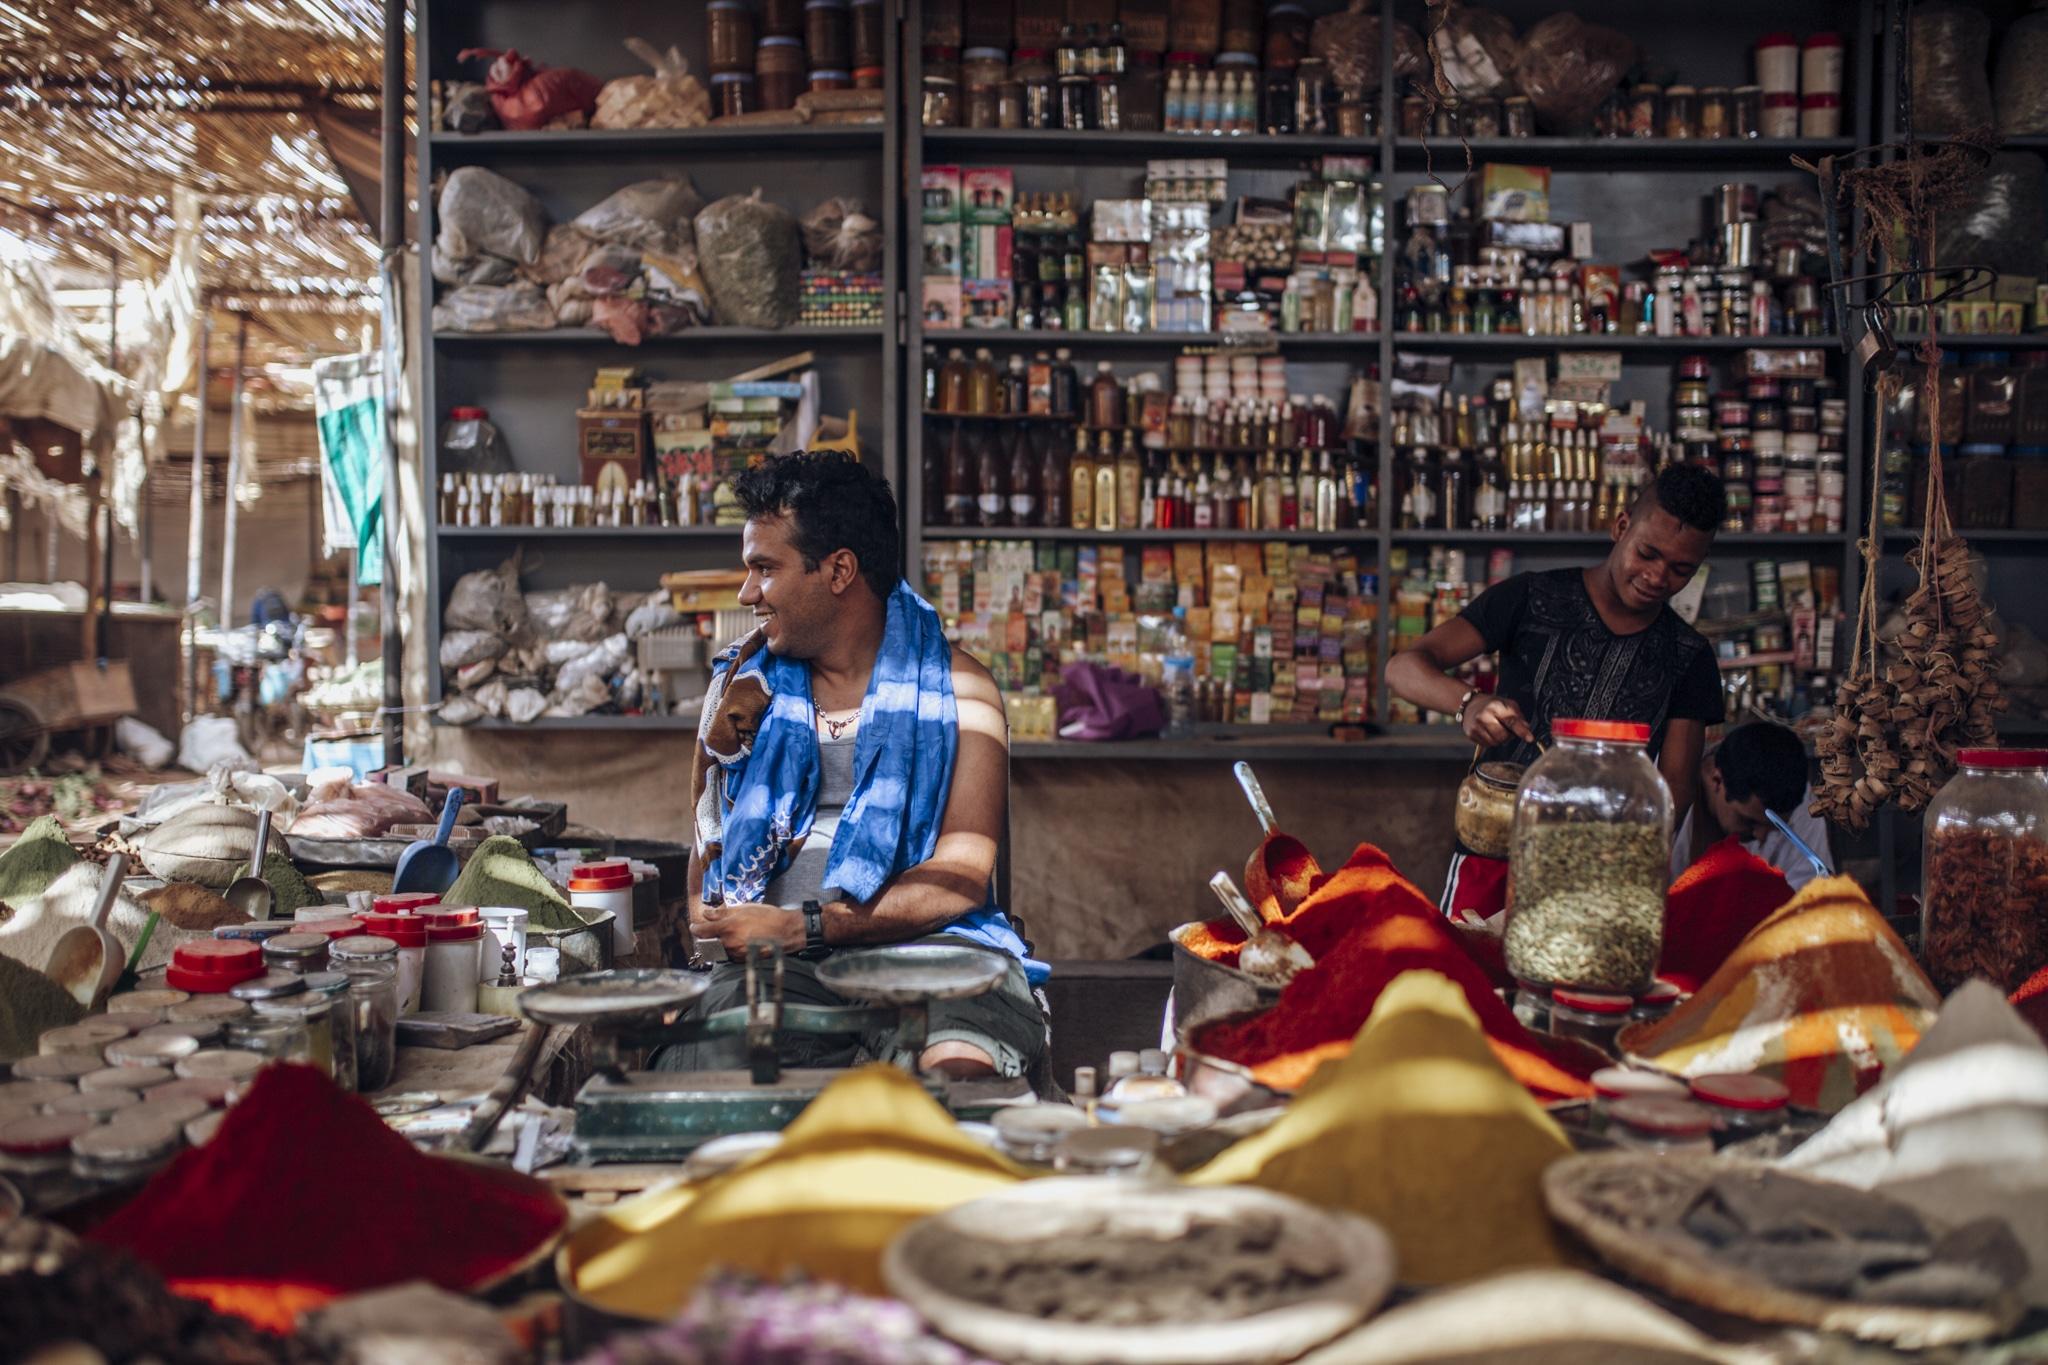 Market in Rissani - Smiling vendor